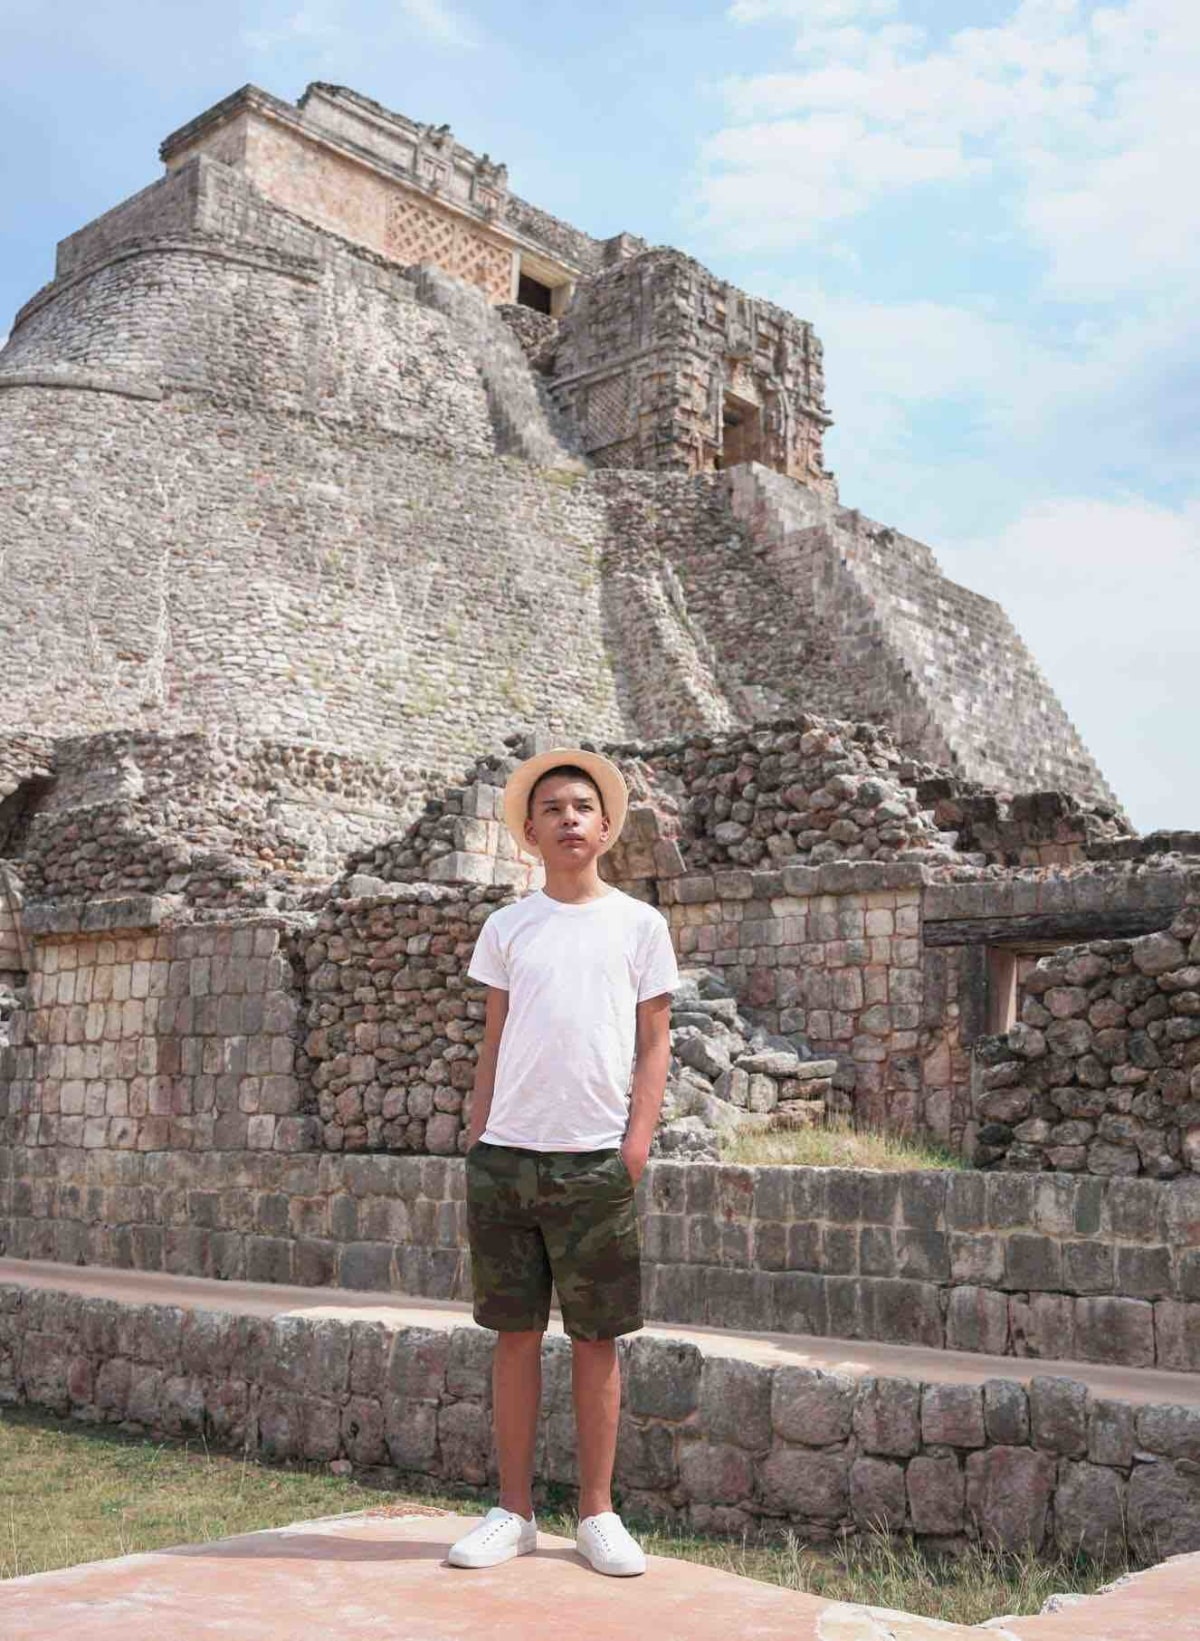 uxamal ruins